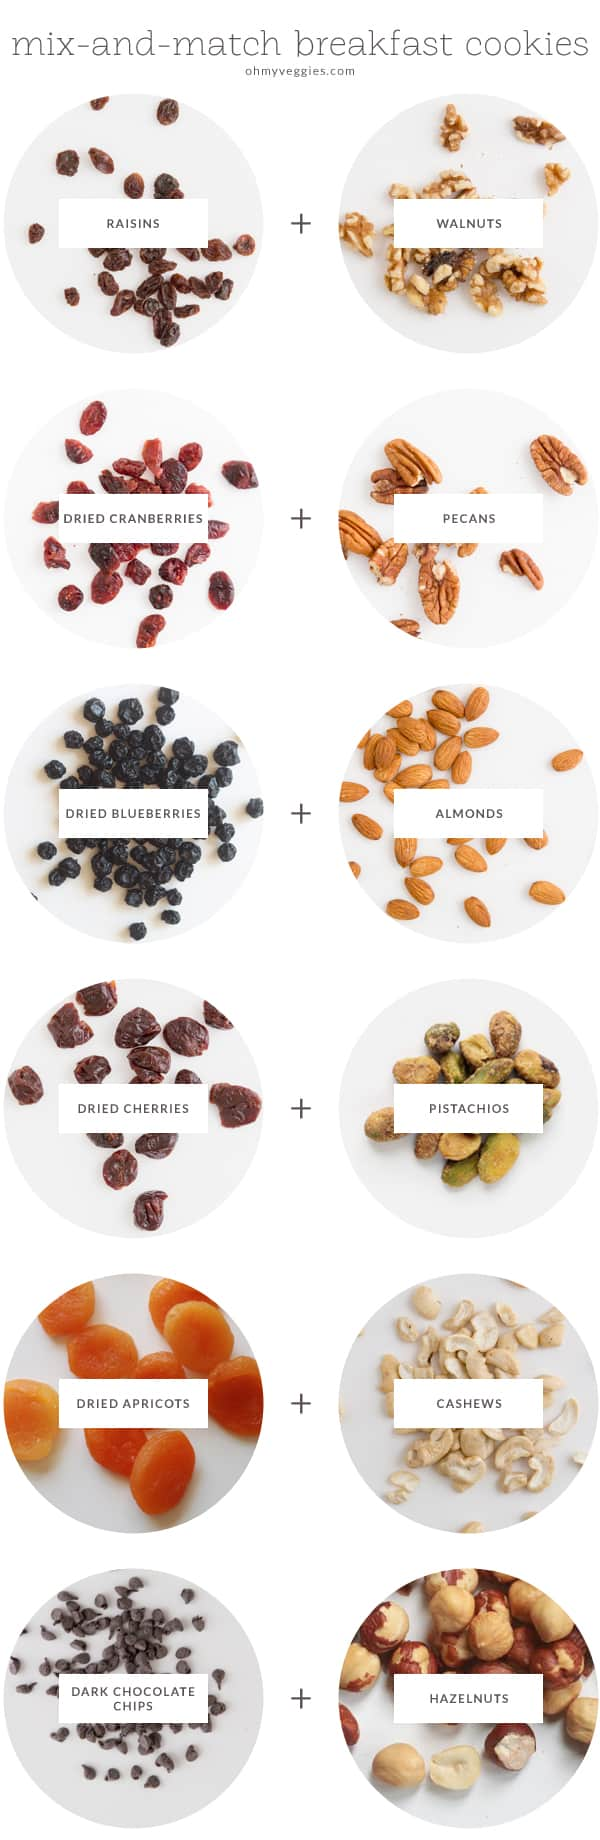 Mix & Match Breakfast Cookie Ingredients